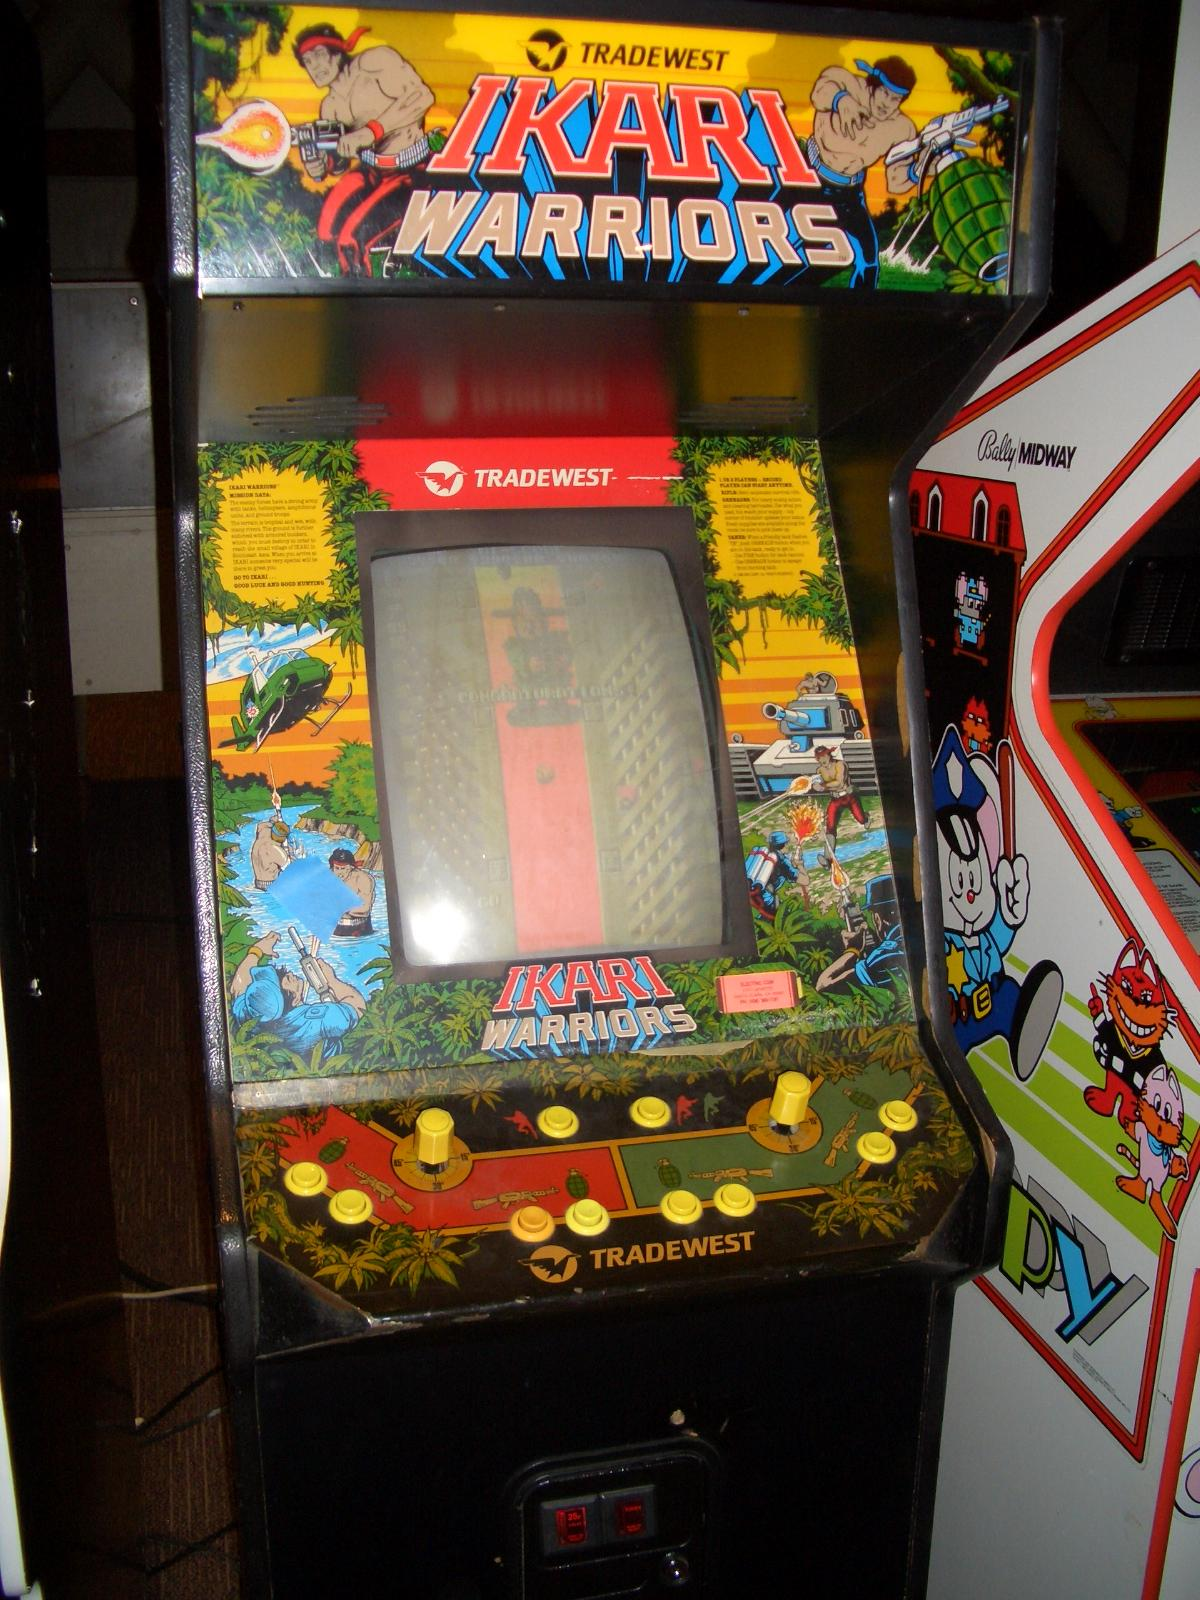 Ikari Warriors Pics, Video Game Collection